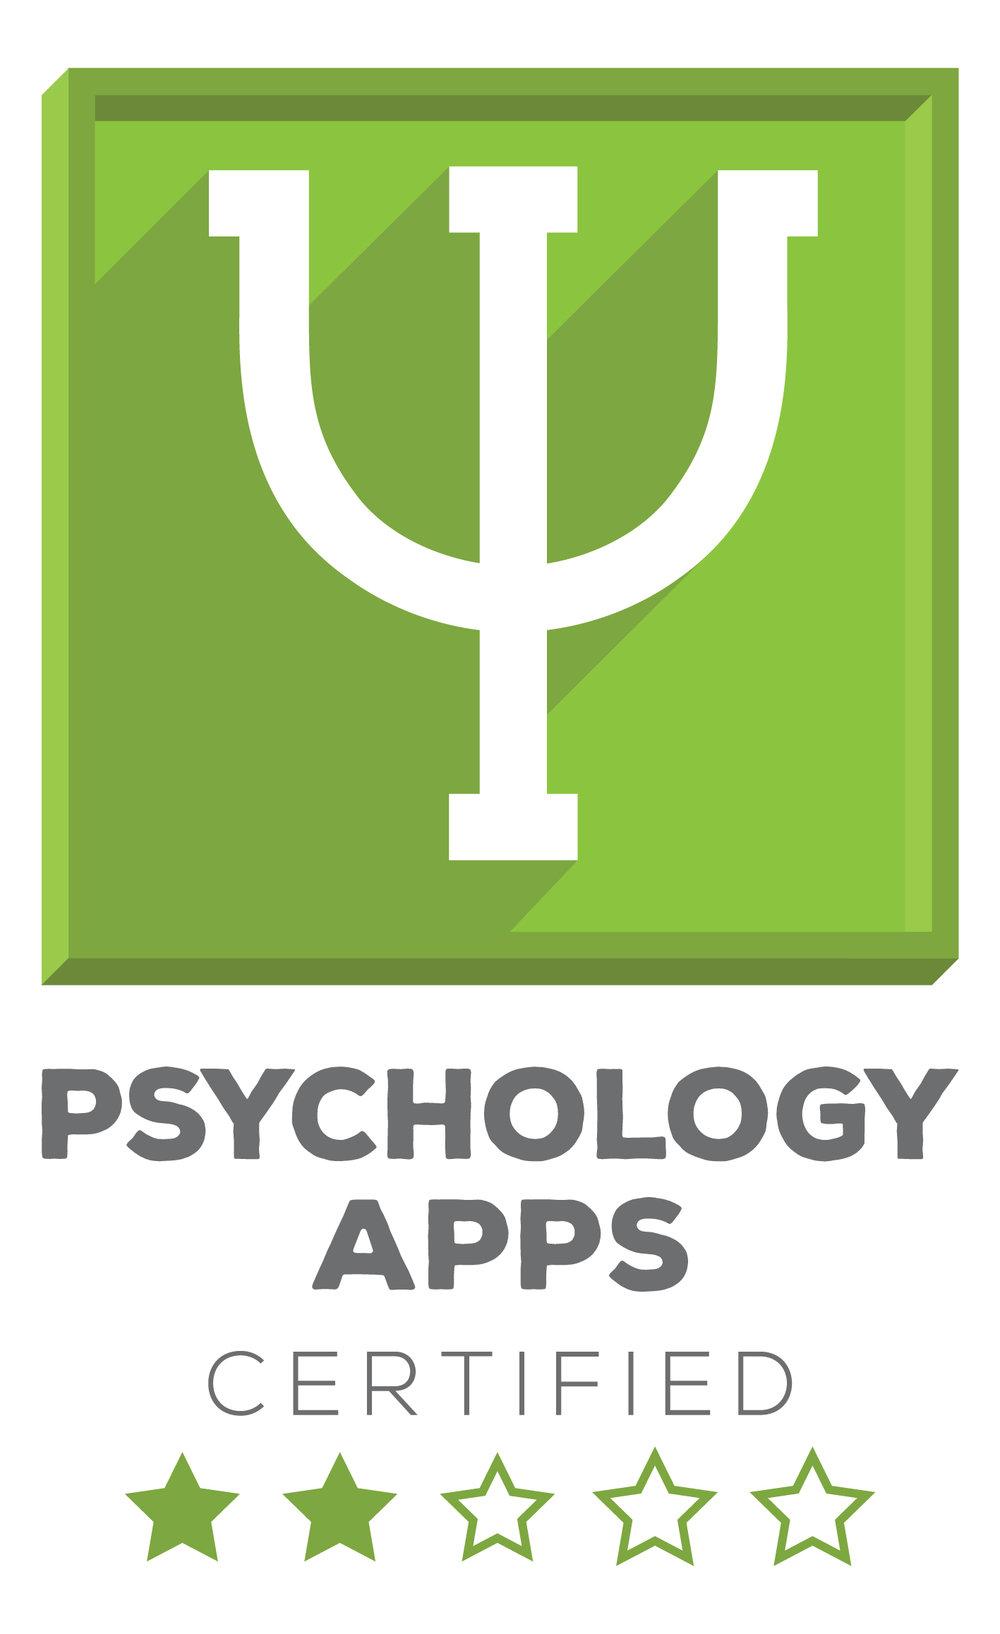 PsychologyApps_logo_Certified_2STAR.jpg